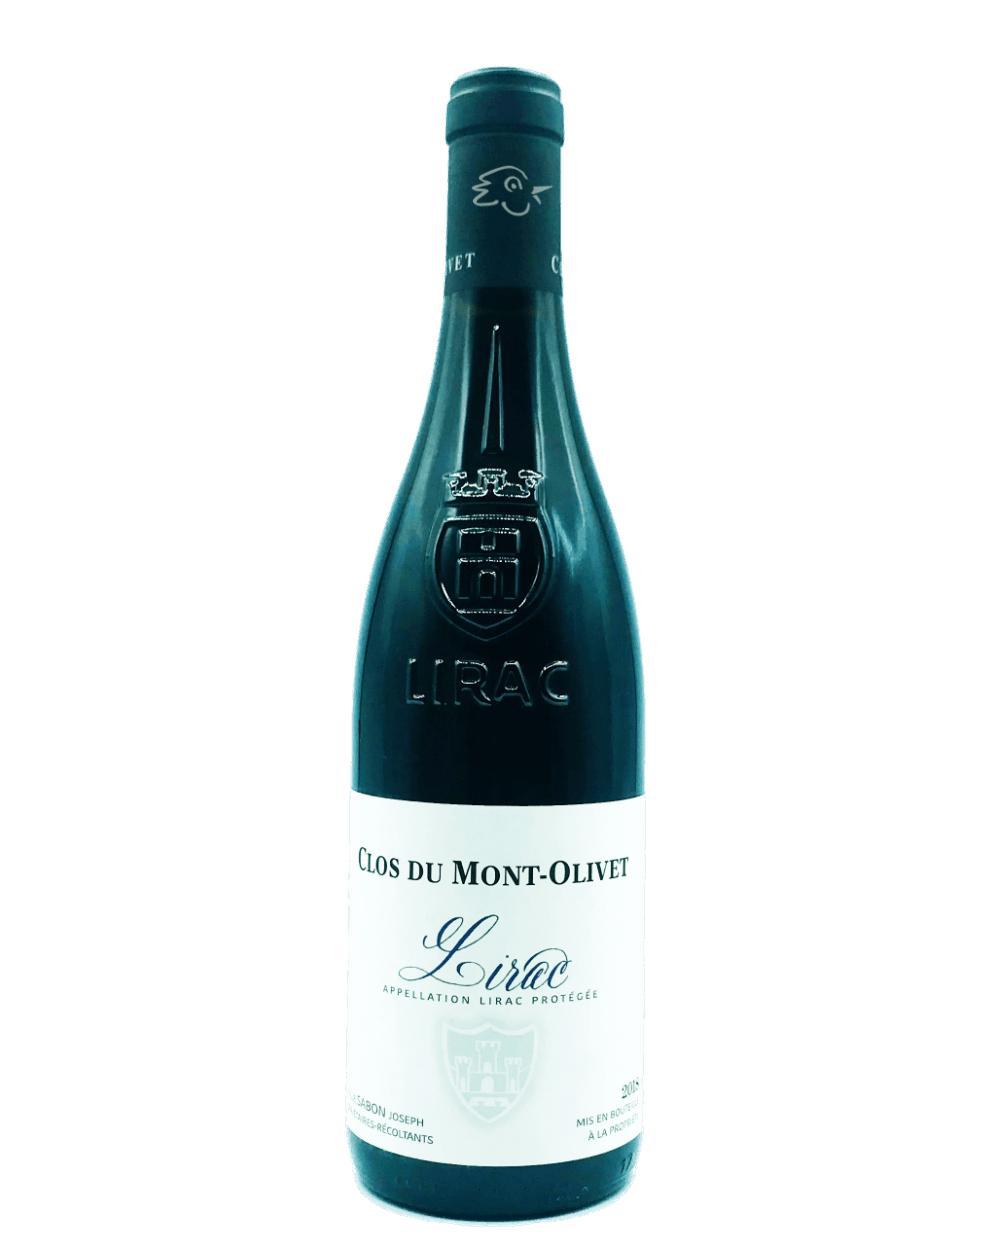 Clos du Mont Olivet - Lirac 2018 - Avintures